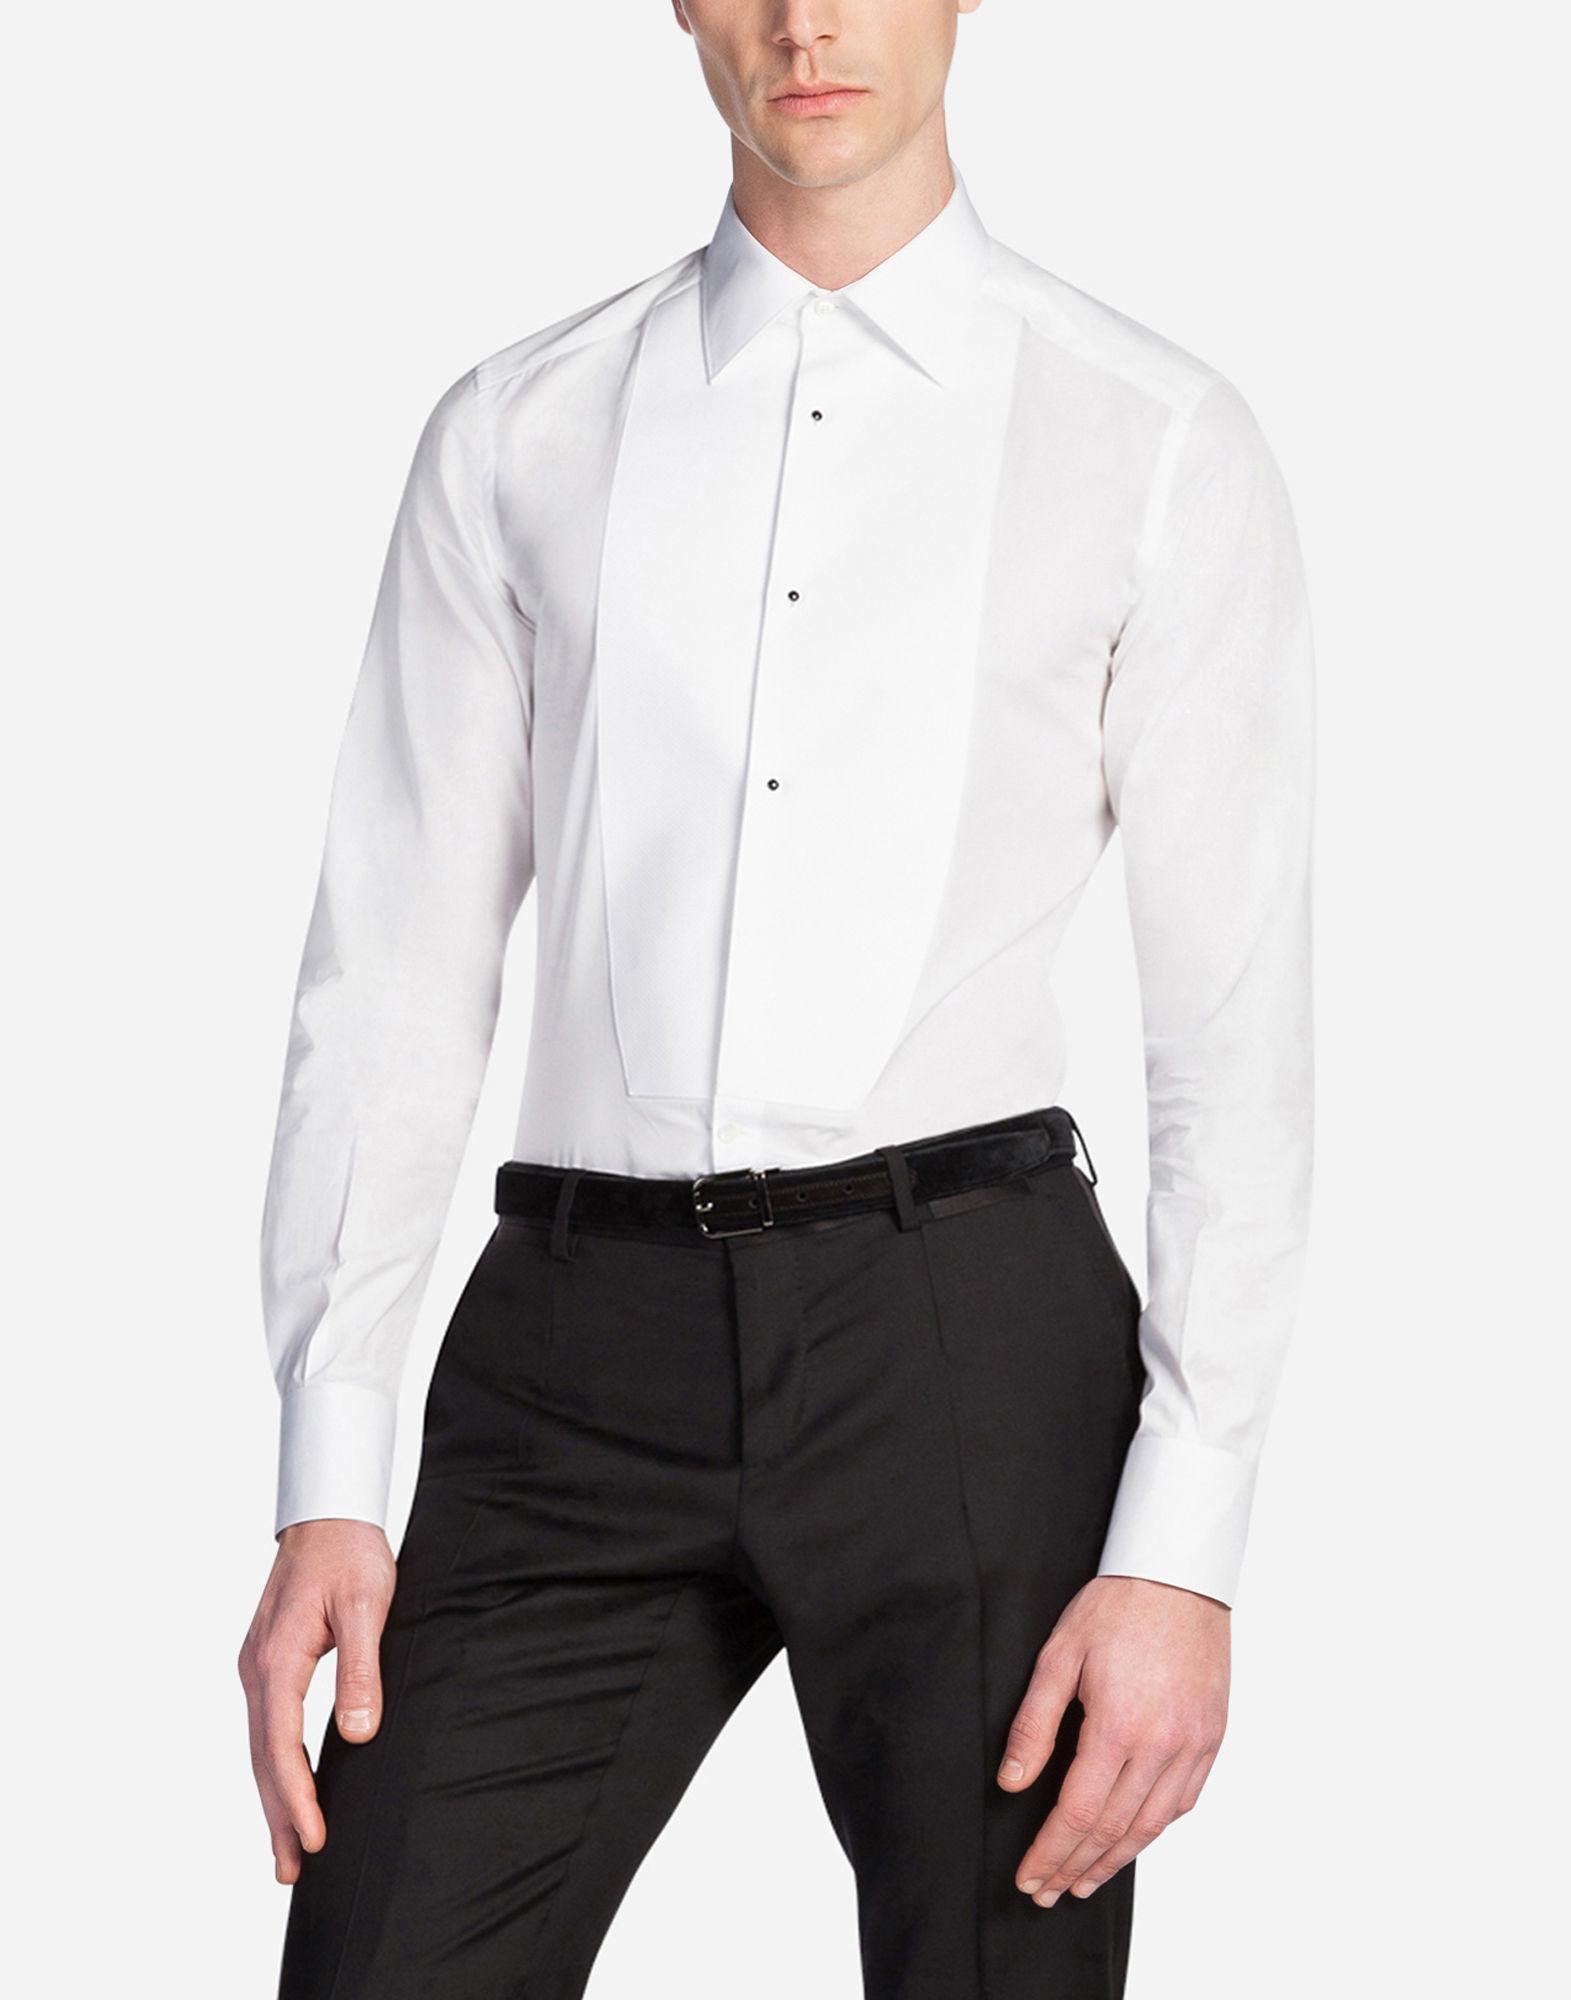 4106e934d29 Dolce & Gabbana Gold Fit Tuxedo Shirt In Cotton Poplin In White ...